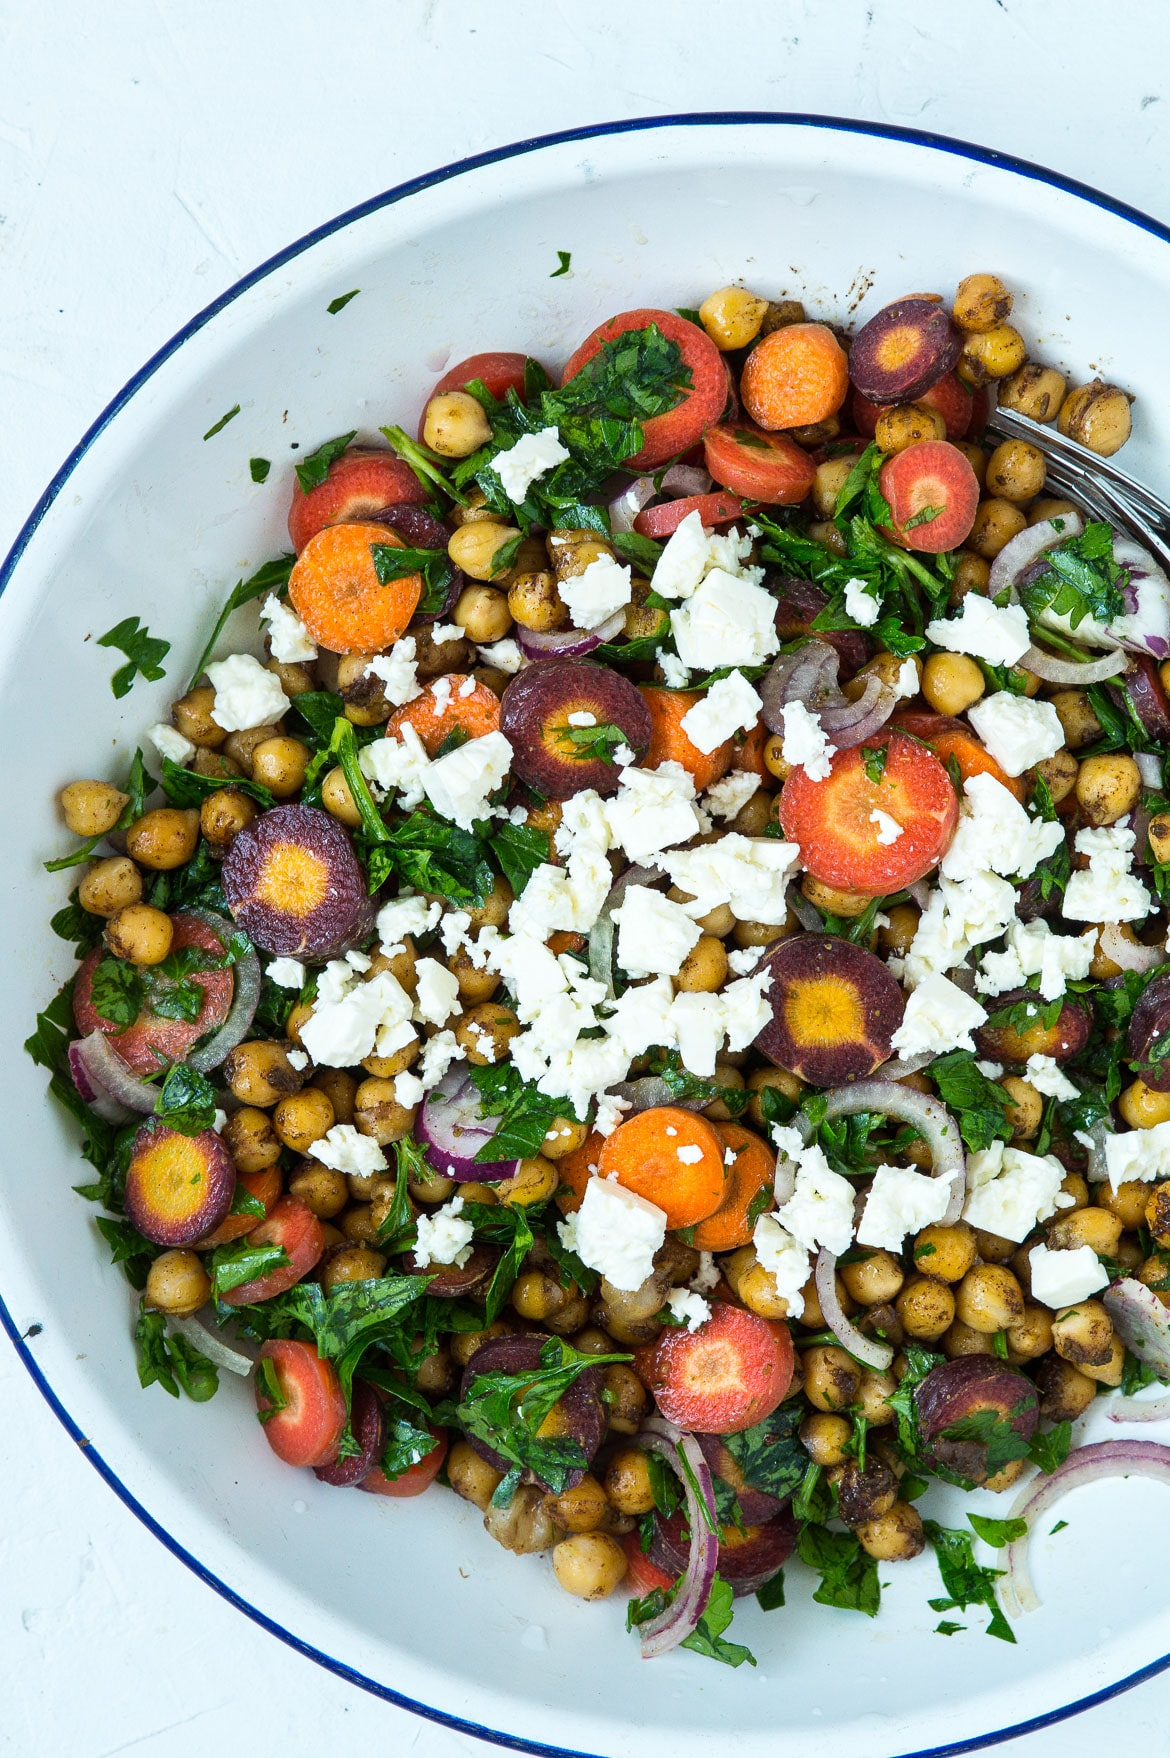 Efterårssalat med gulerødder, ristede kikærter, persille og feta